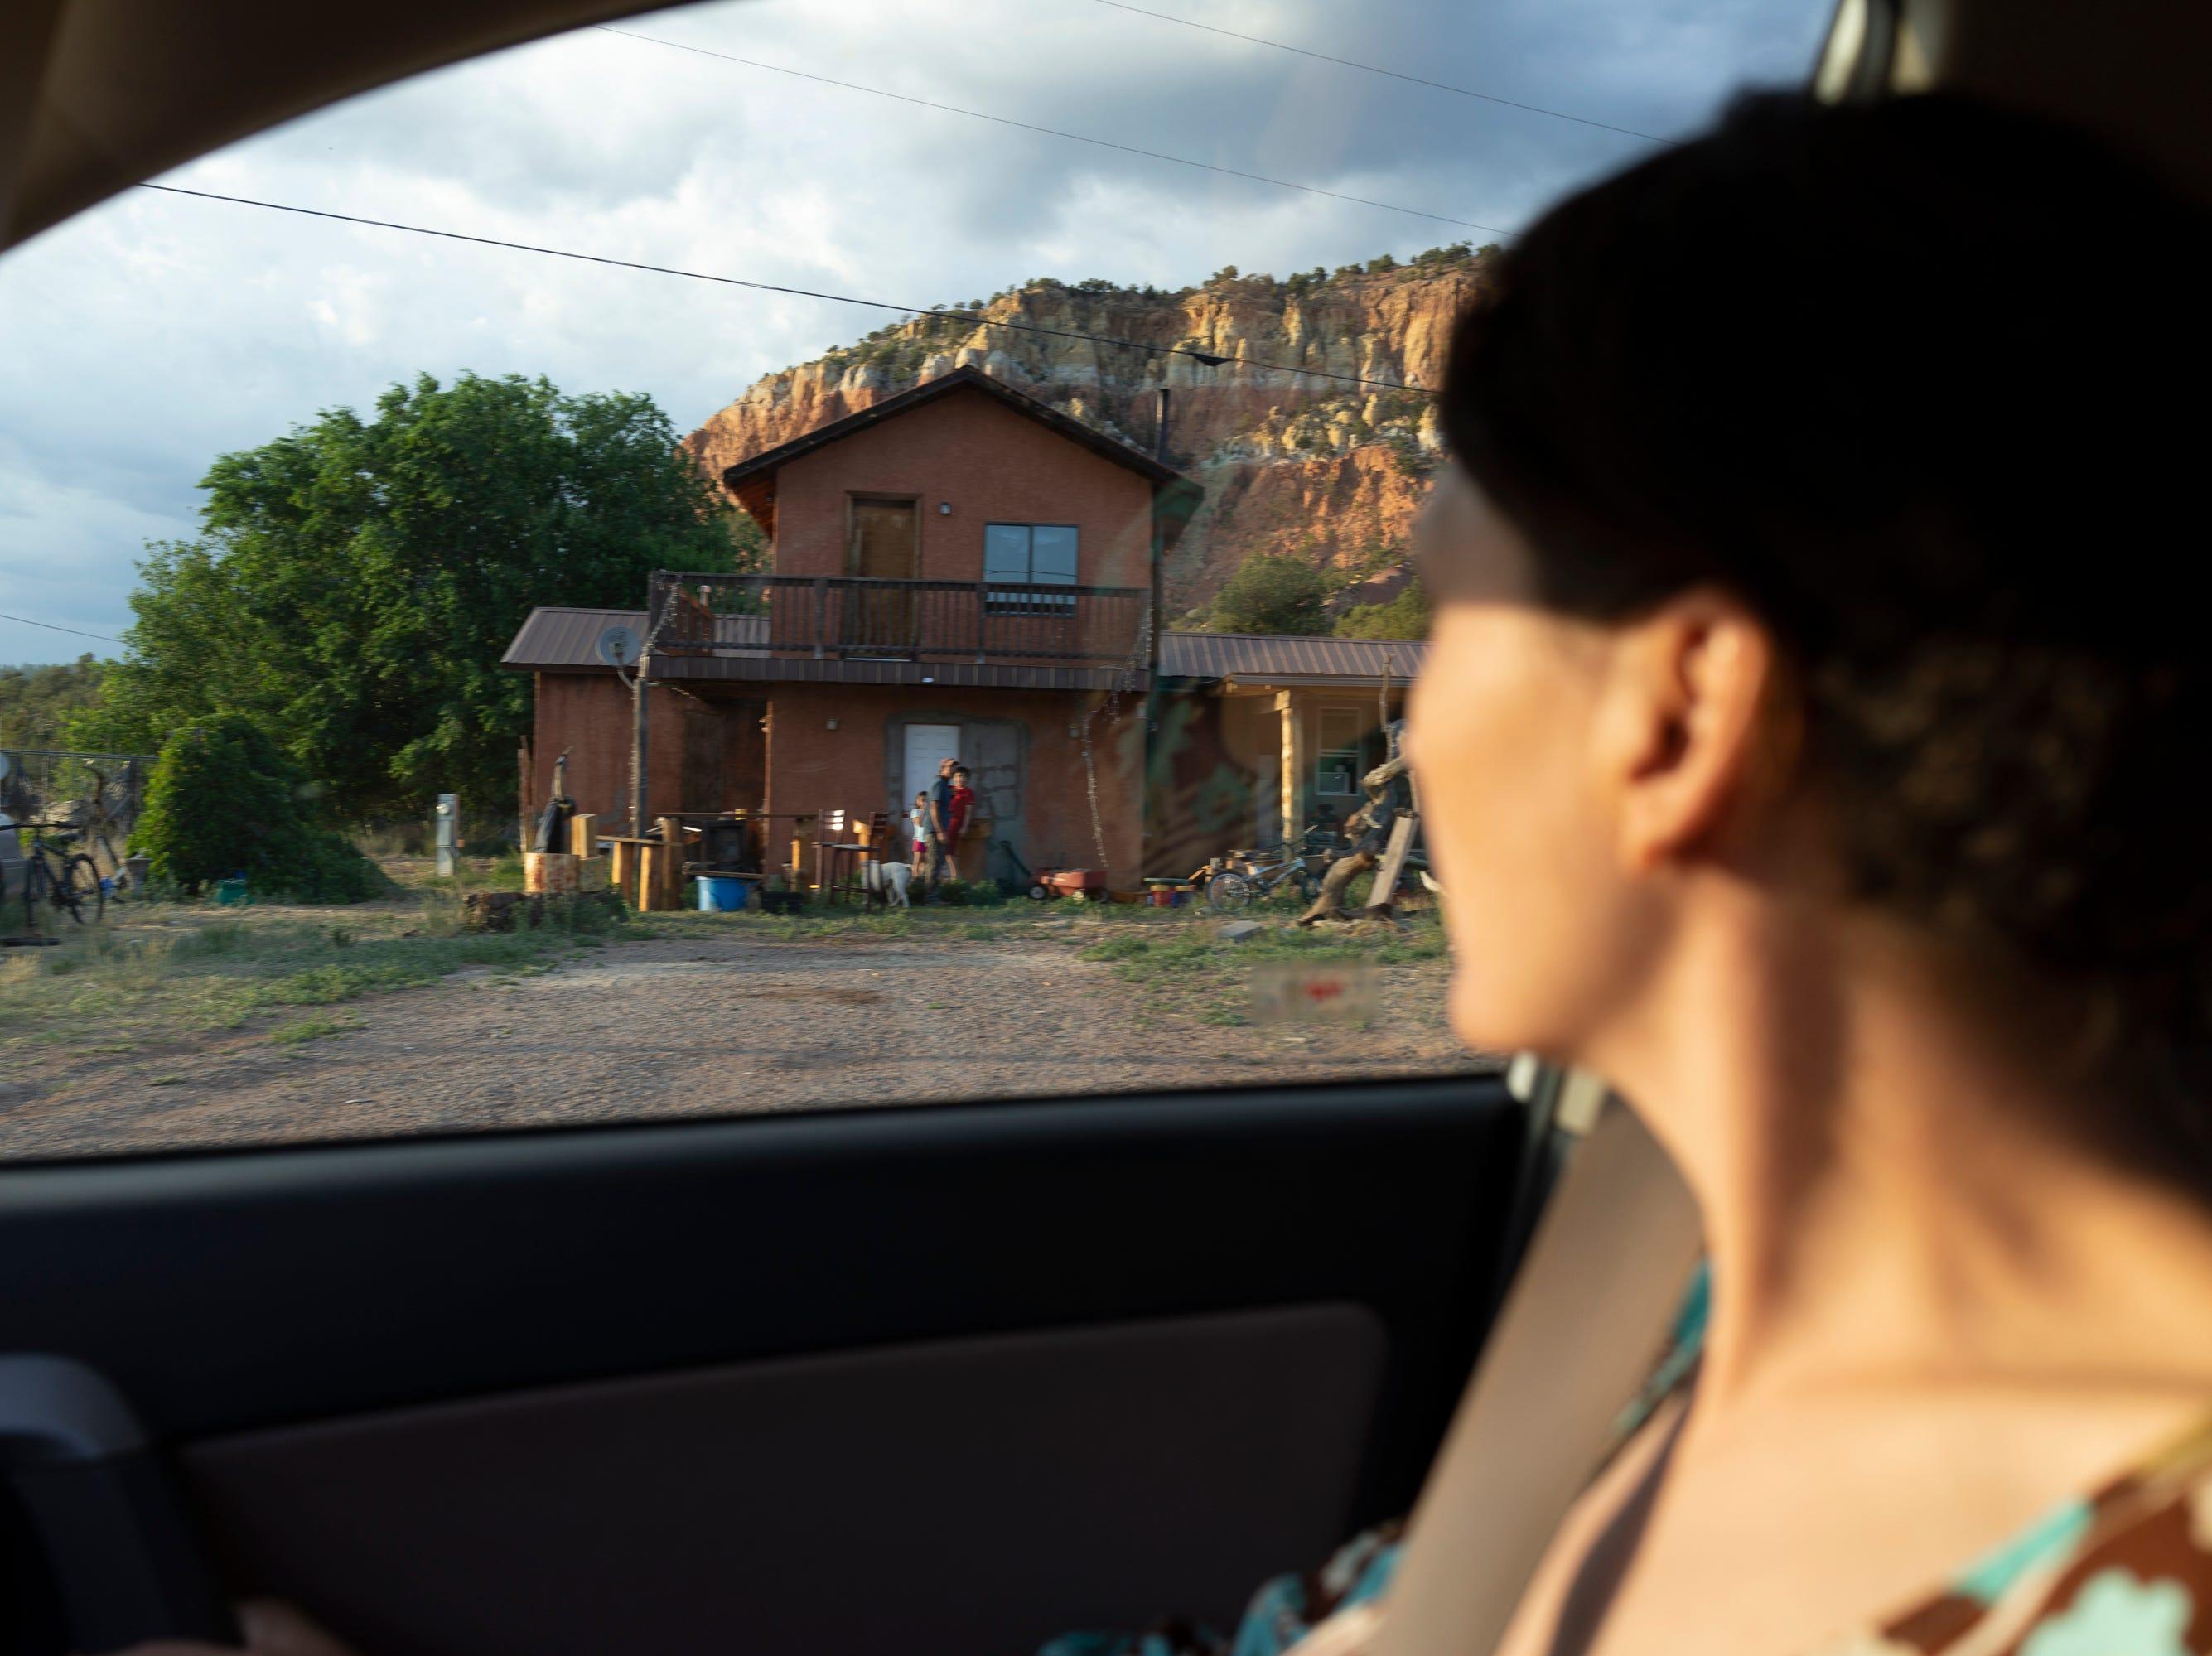 Emilia saying goodbye to her children in Gallina.